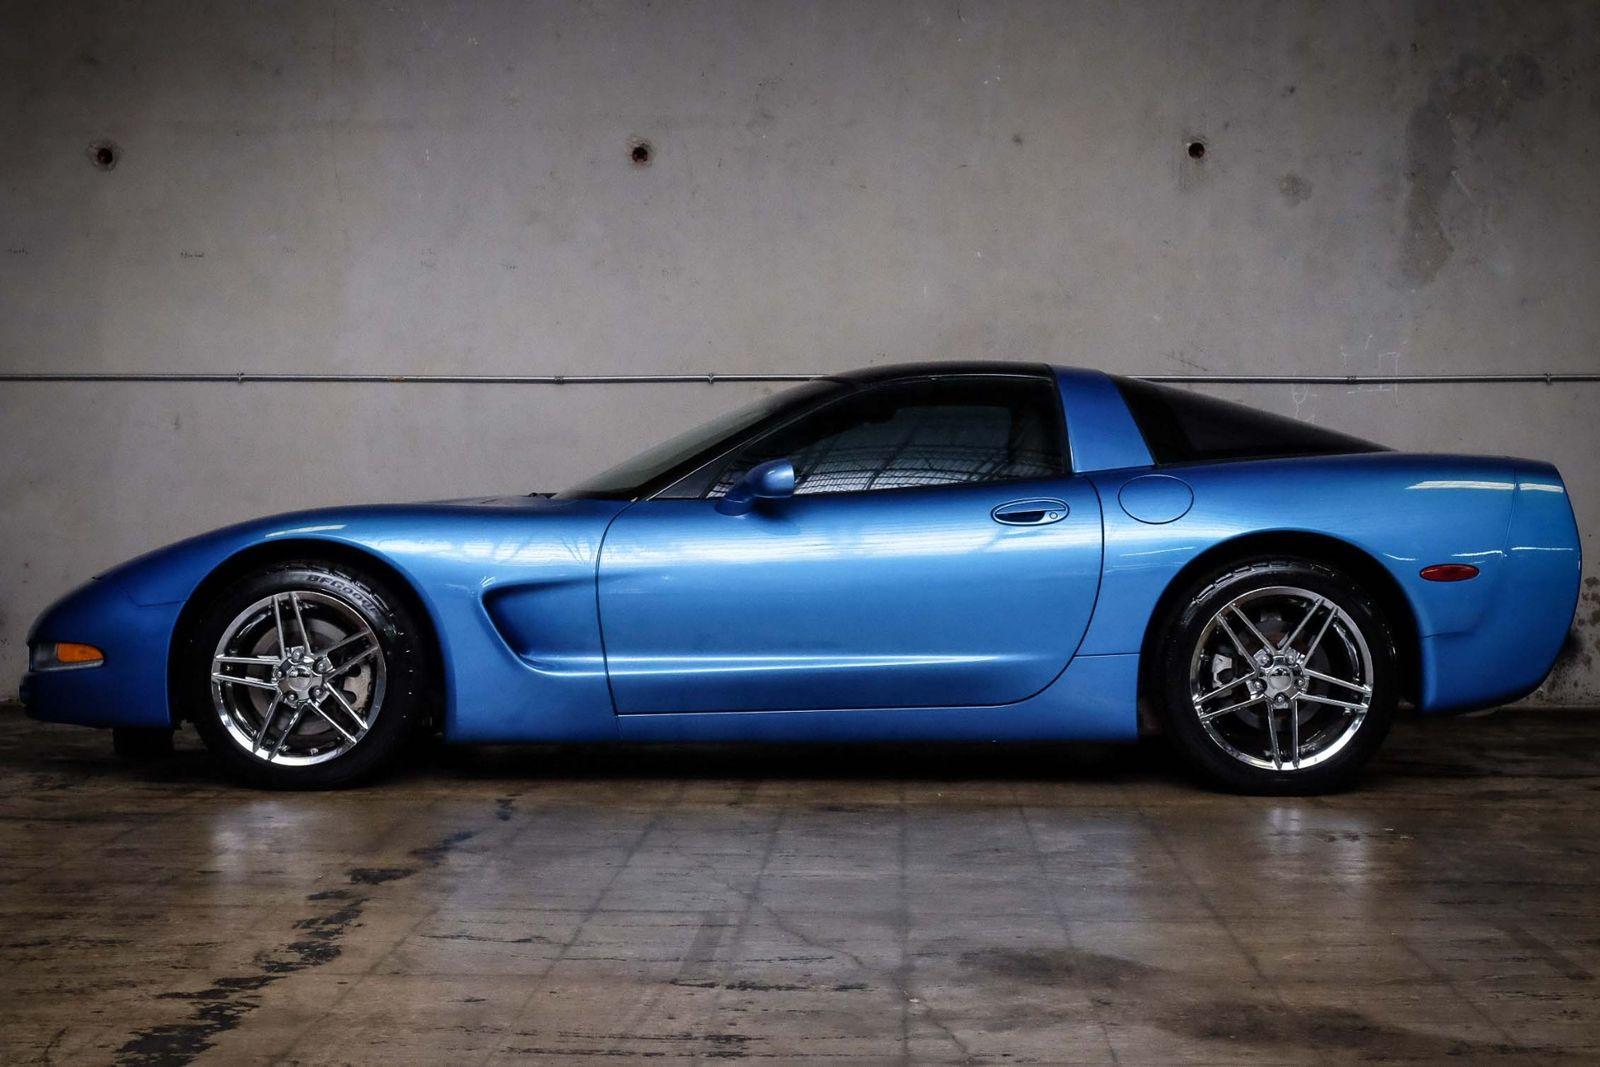 2000 Blue Chevrolet Corvette   | C5 Corvette Photo 9